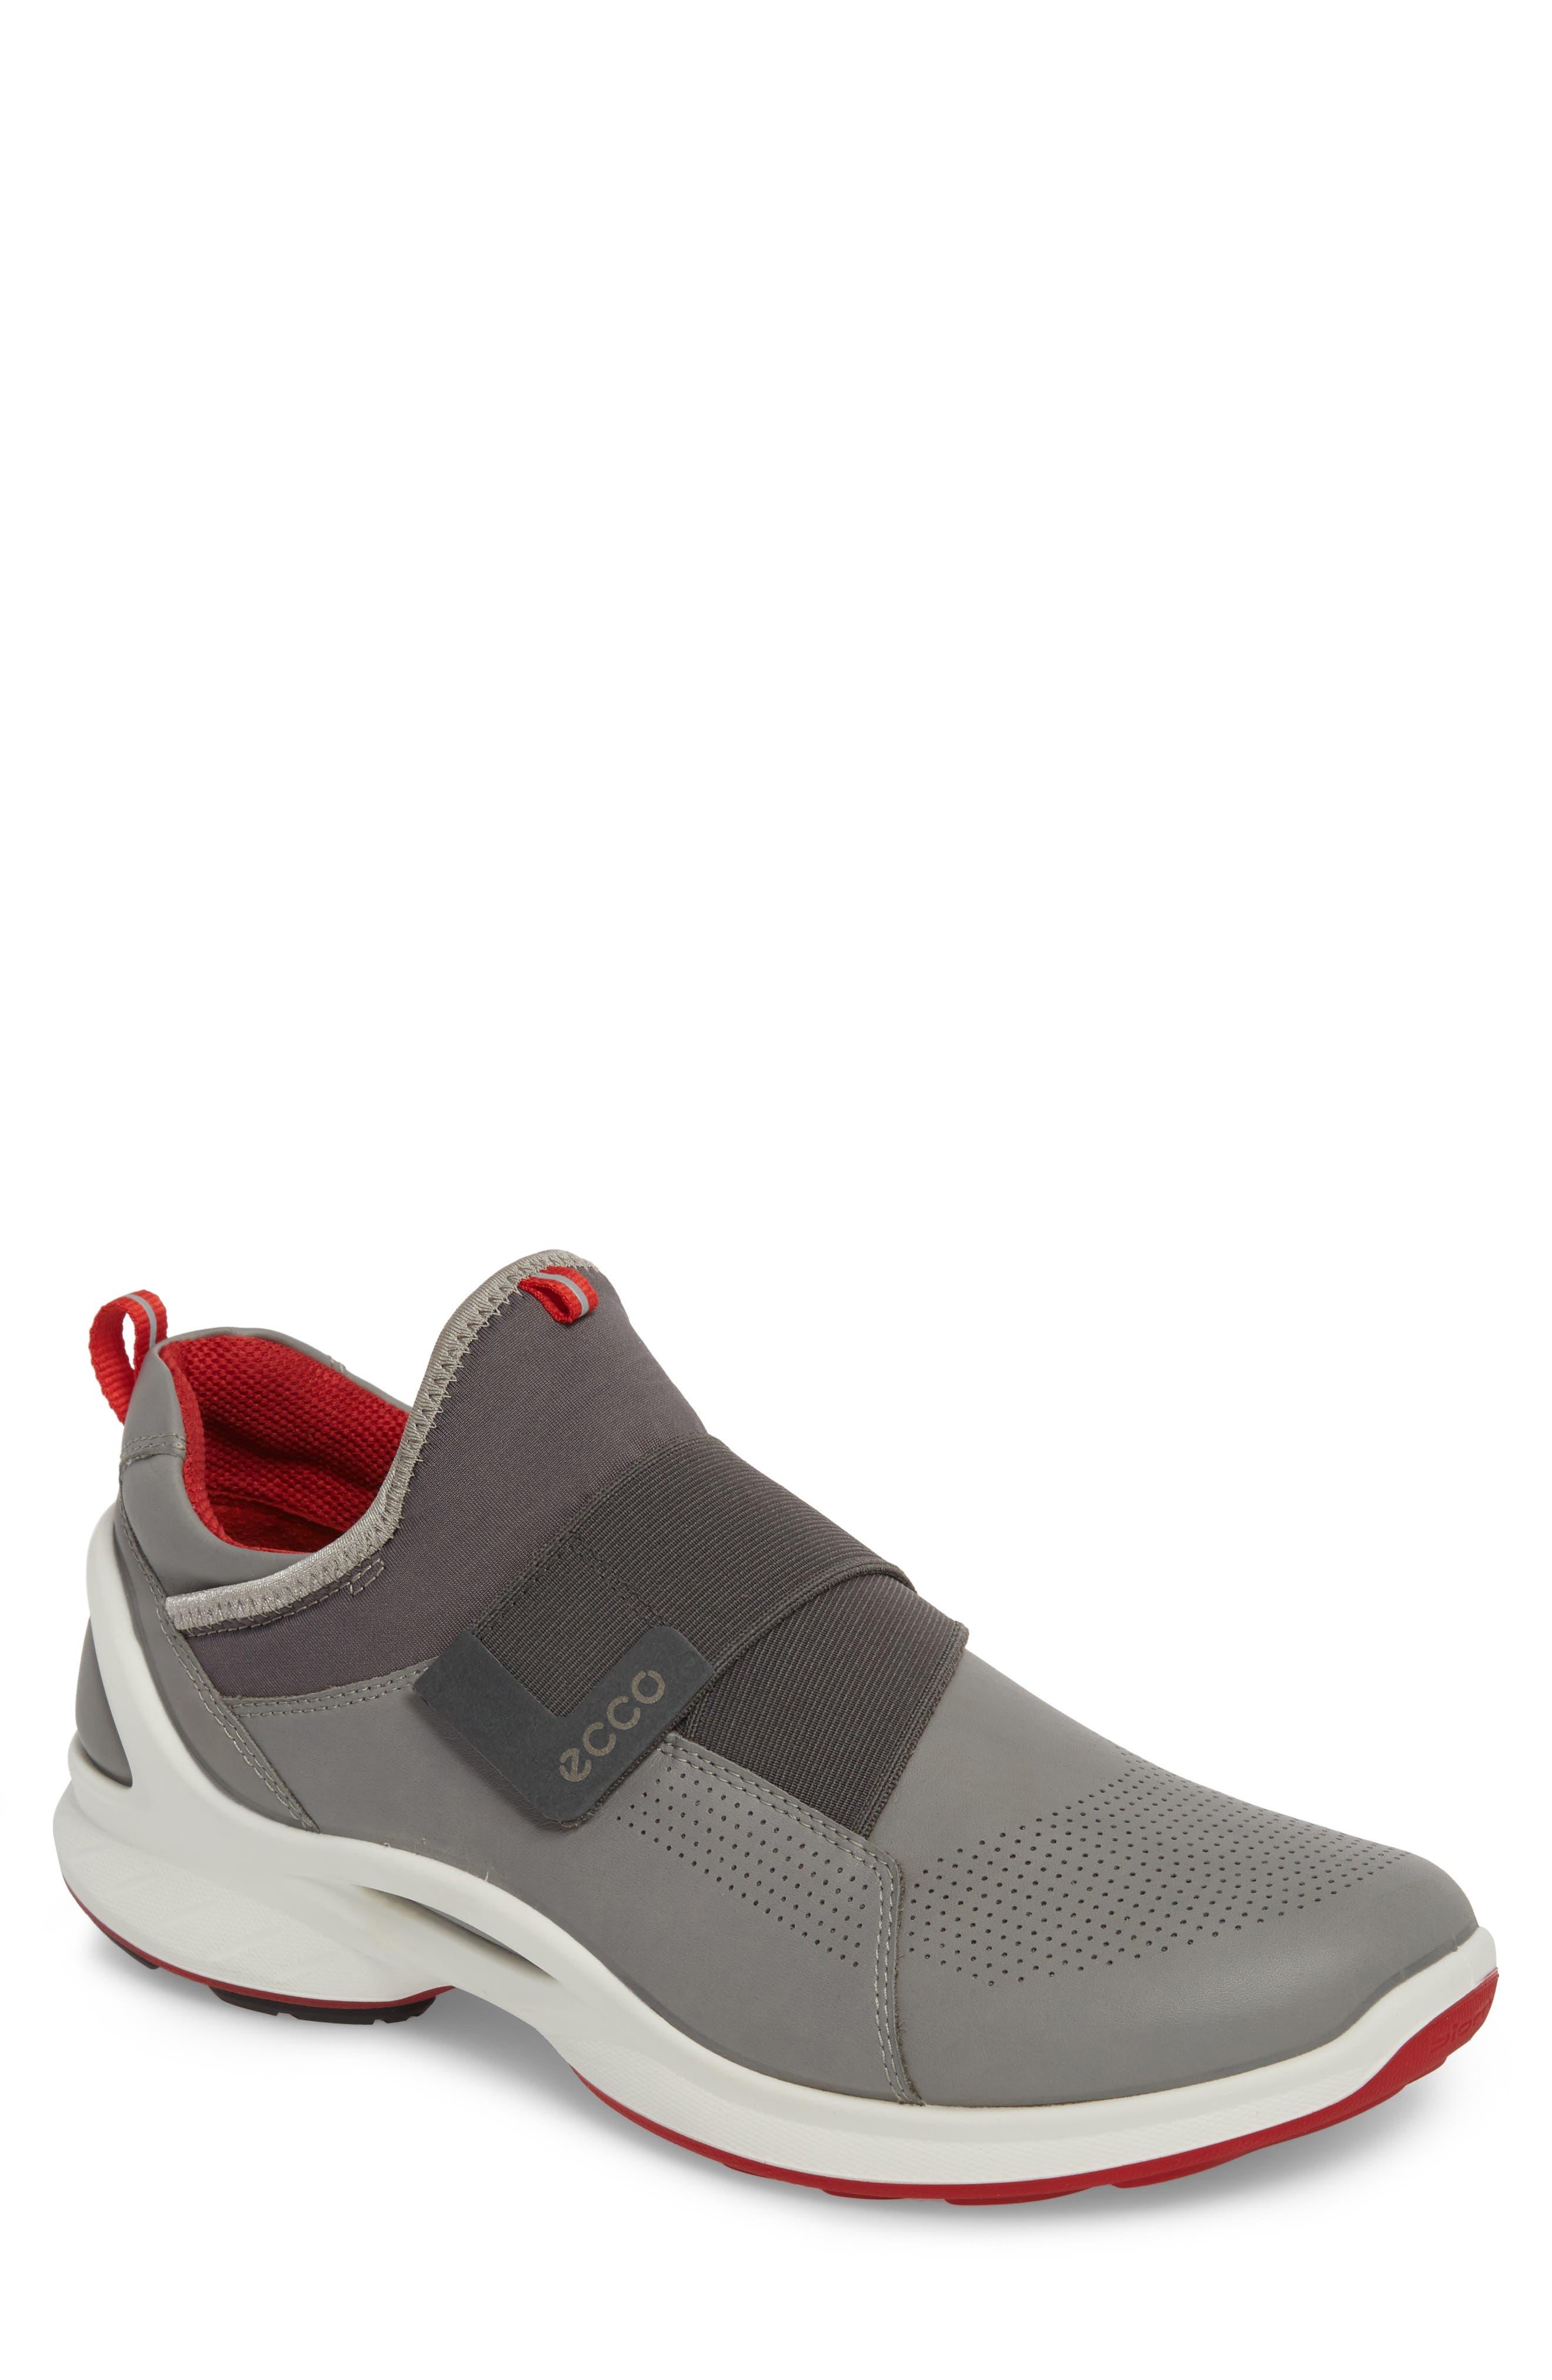 BIOM Fjuel Band Sneaker,                         Main,                         color, Dark Shadow/ Titanium Leather